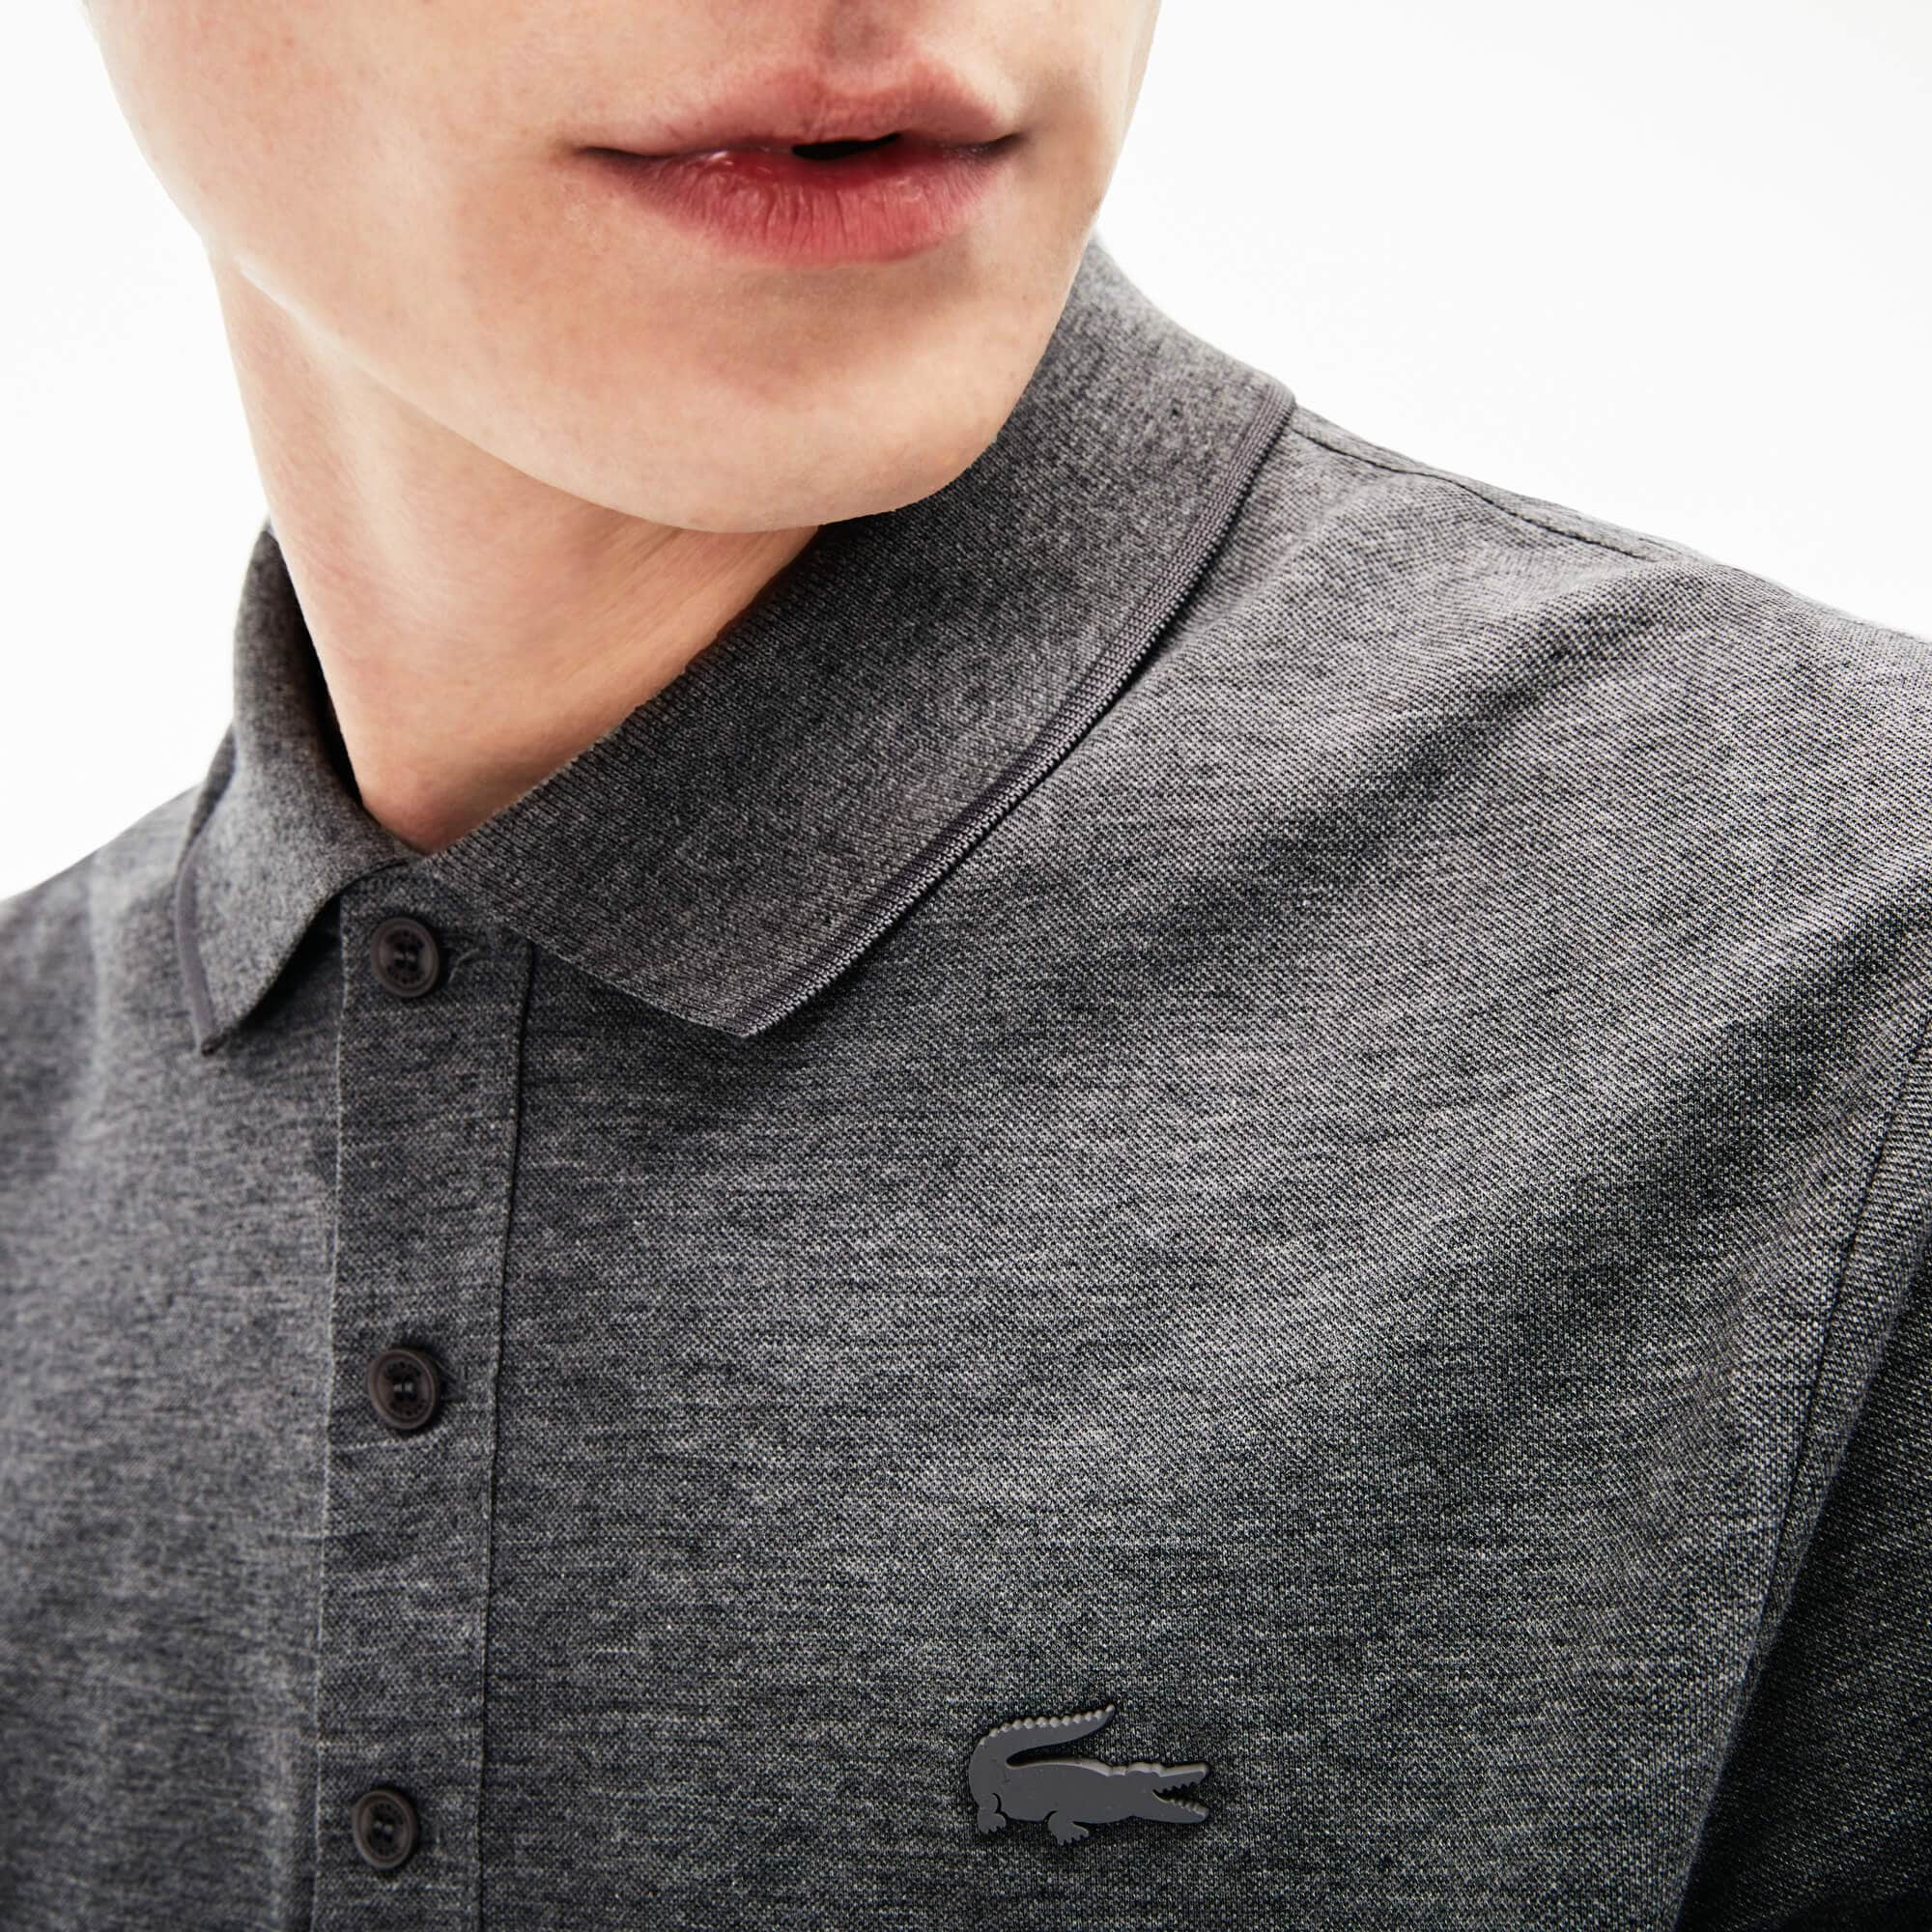 Regular Fit Herren-Poloshirt MOTION aus Pima-Baumwoll-Piqué